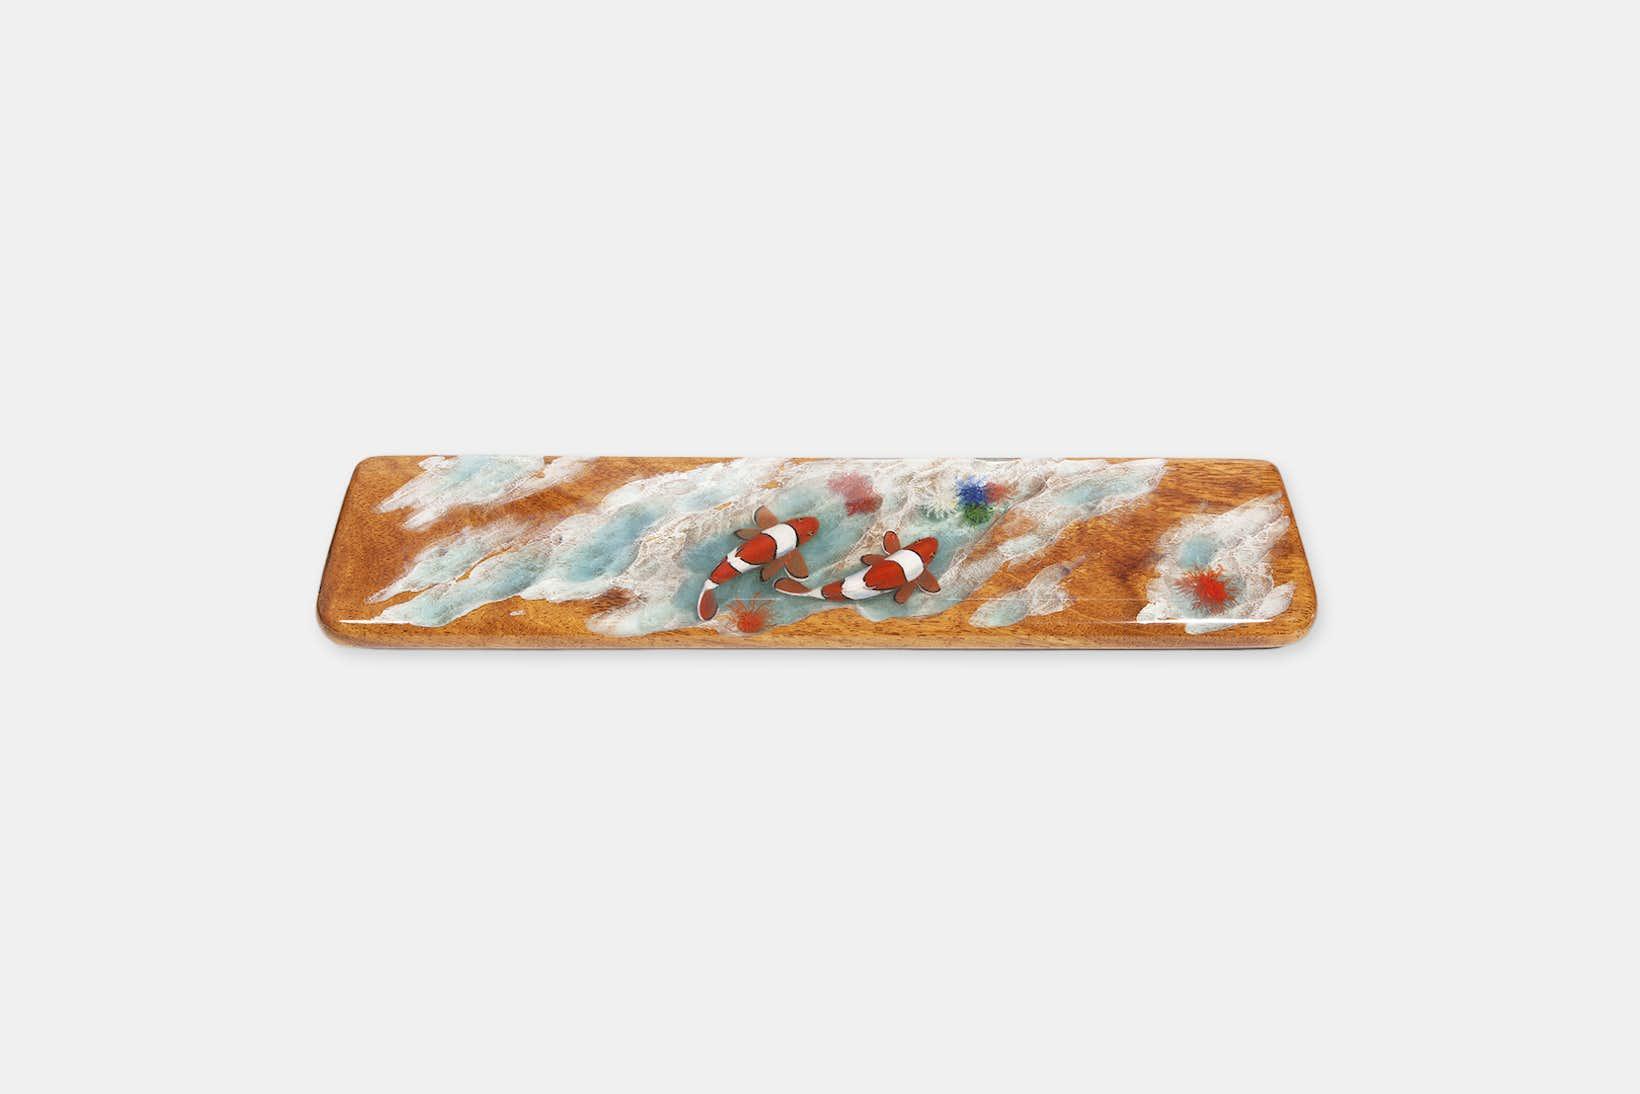 Moon Key Hand-Painted Clownfish Artisan Wrist Rest - TKL